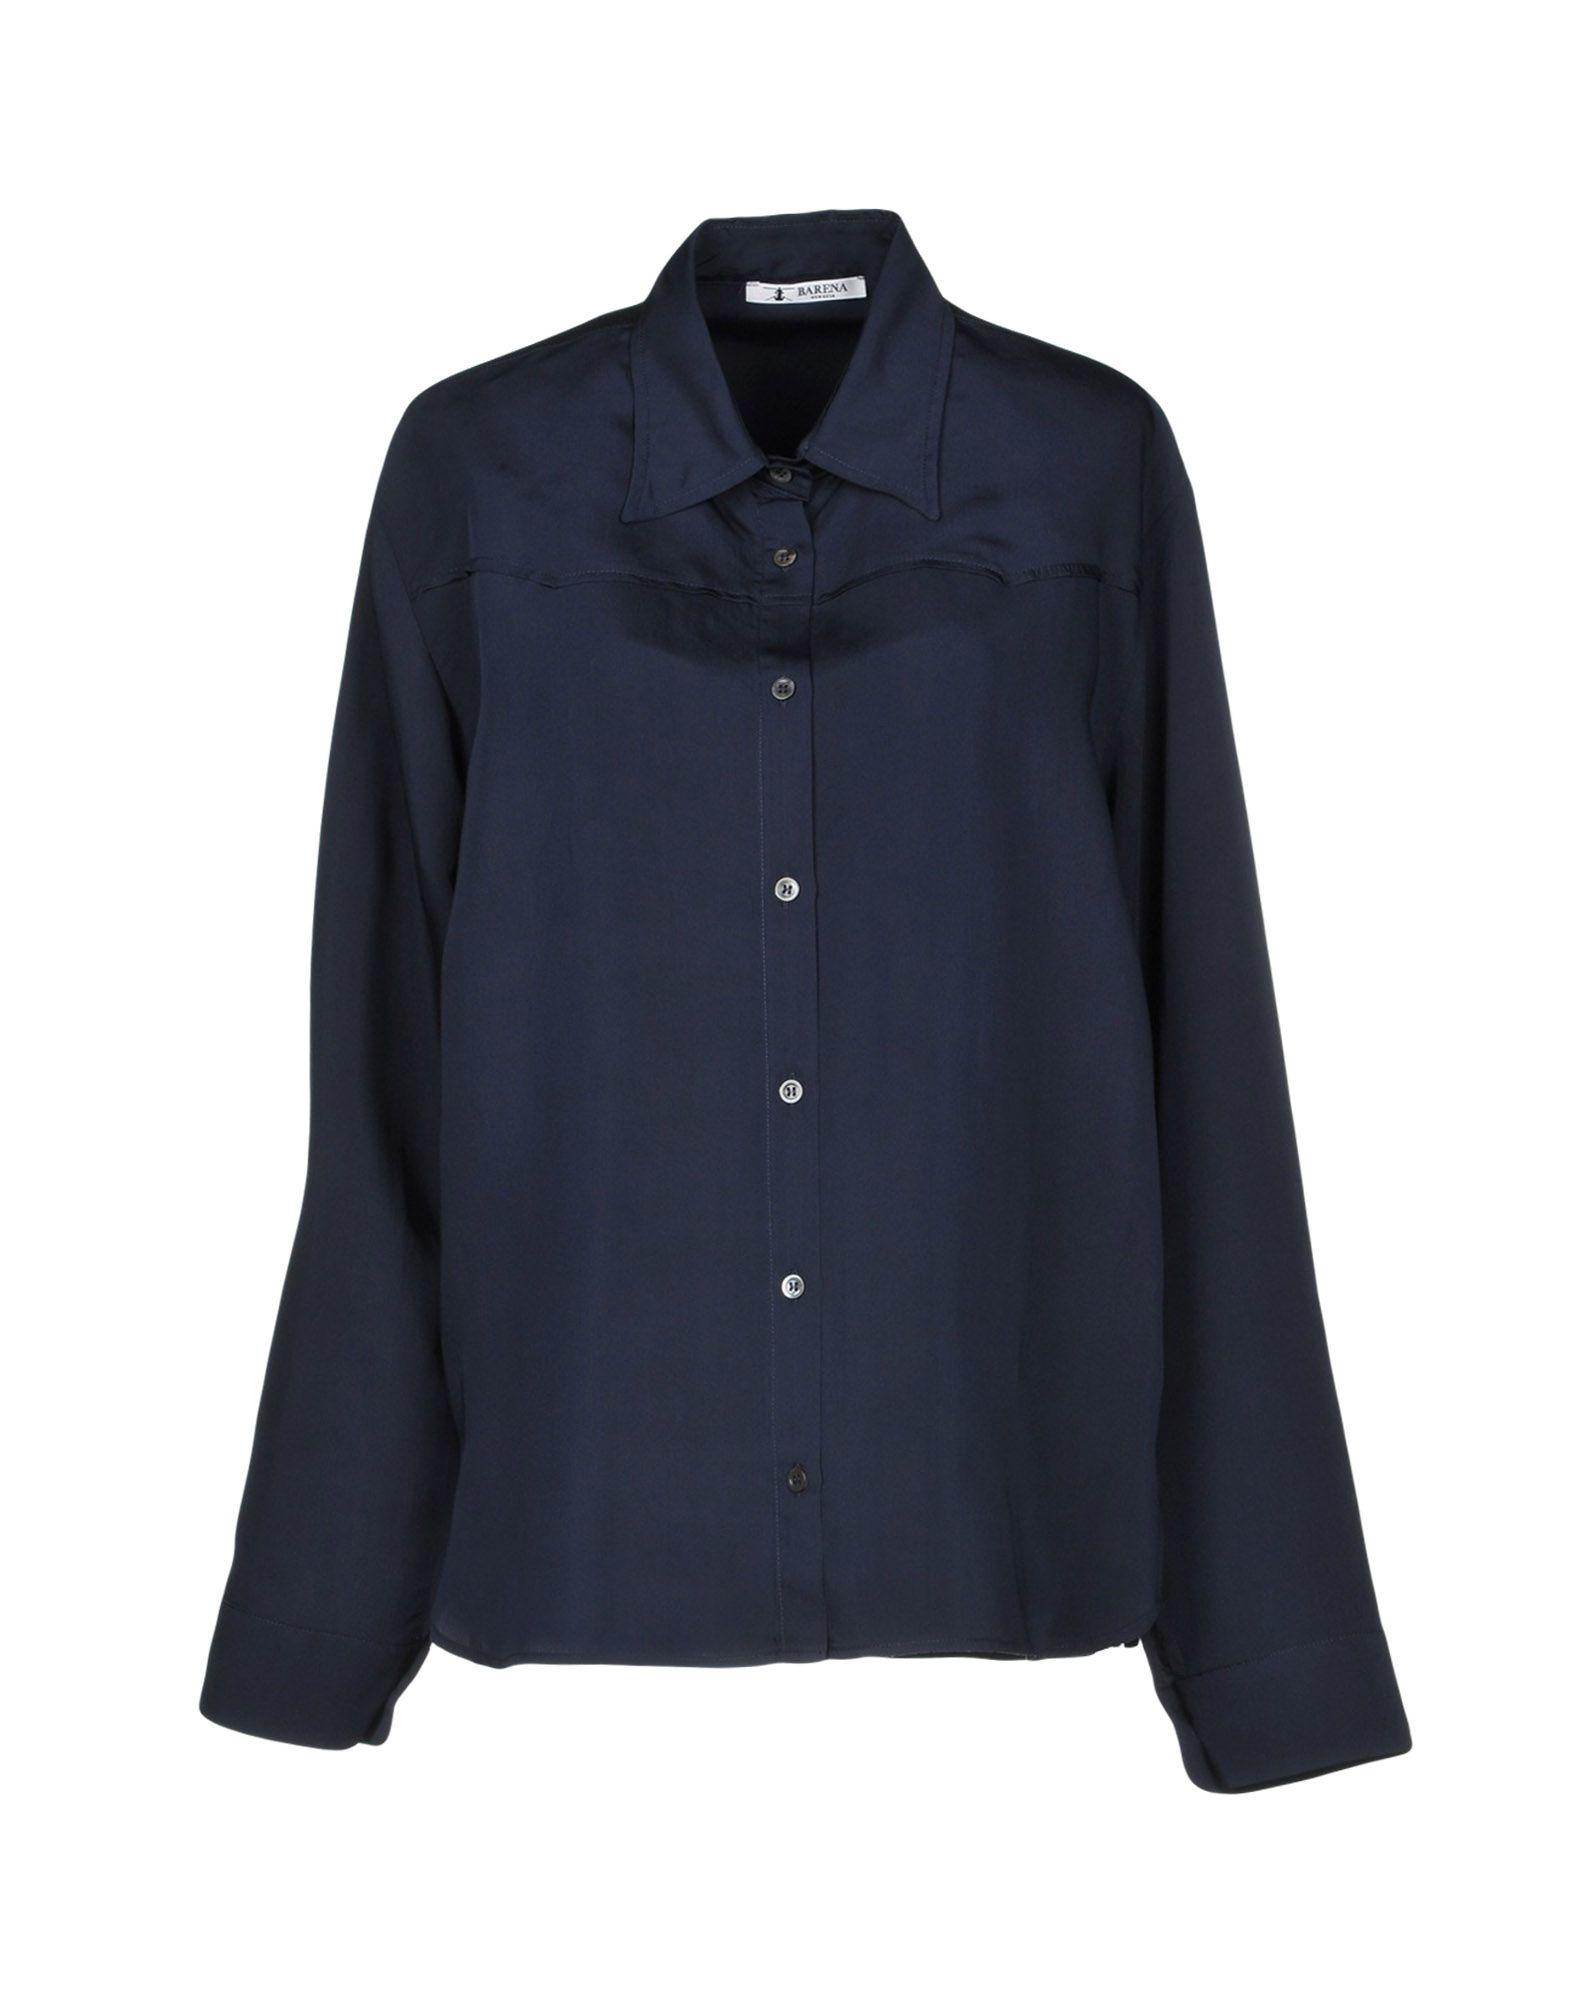 Barena Venezia Solid Color Shirts & Blouses In Dark Blue